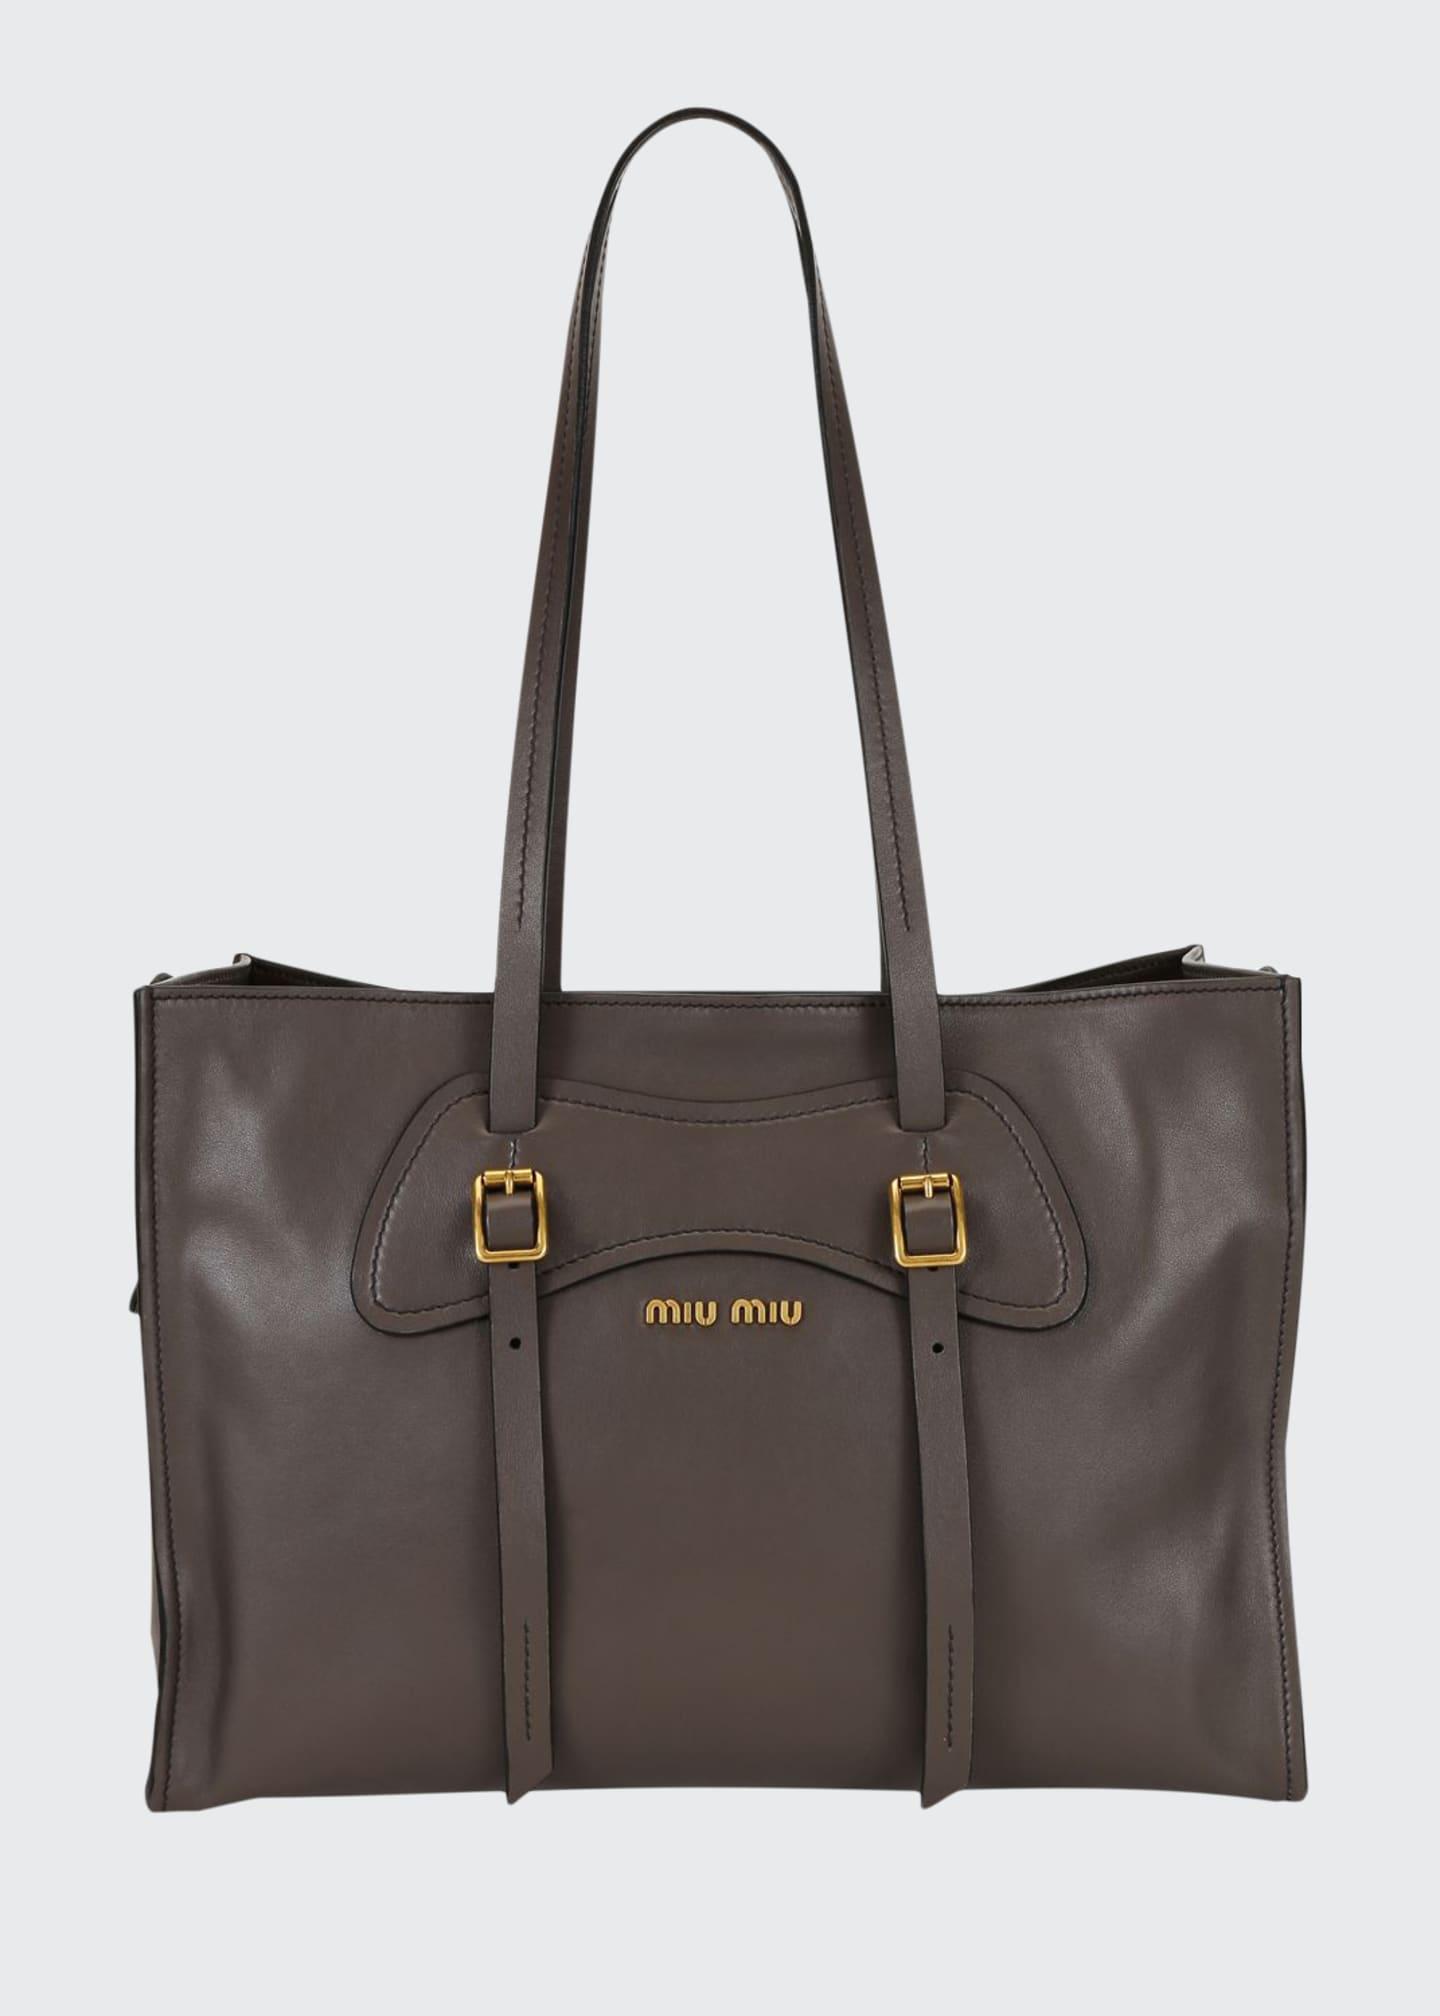 Miu Miu Grace Leather Logo Tote Bag